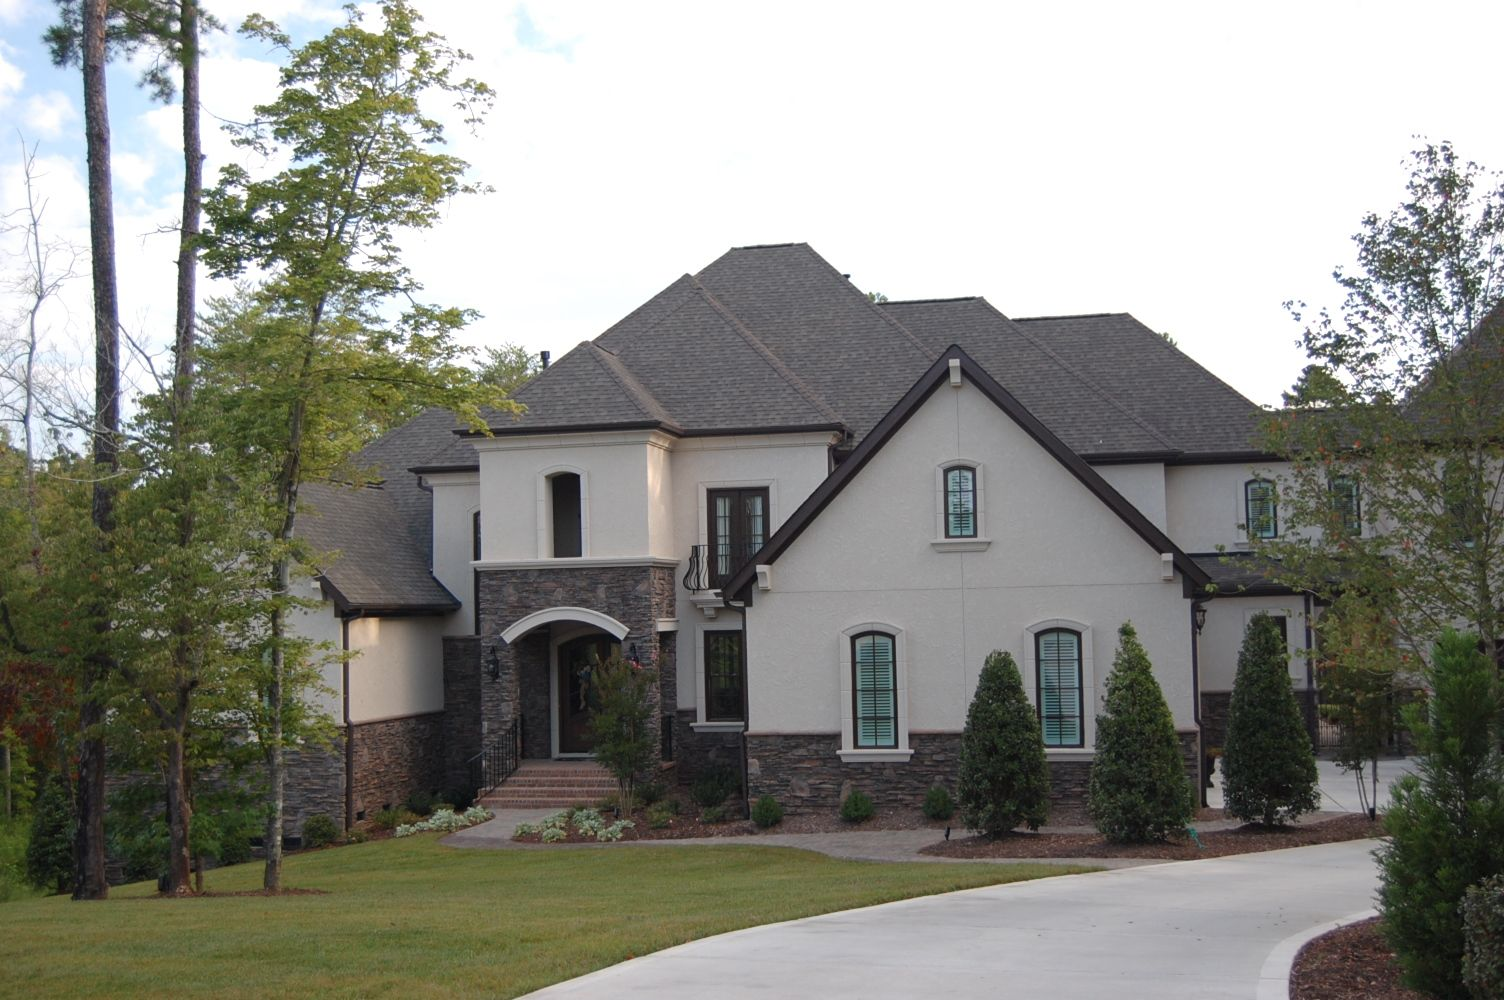 Stone Cladding Interior Living Rooms Home